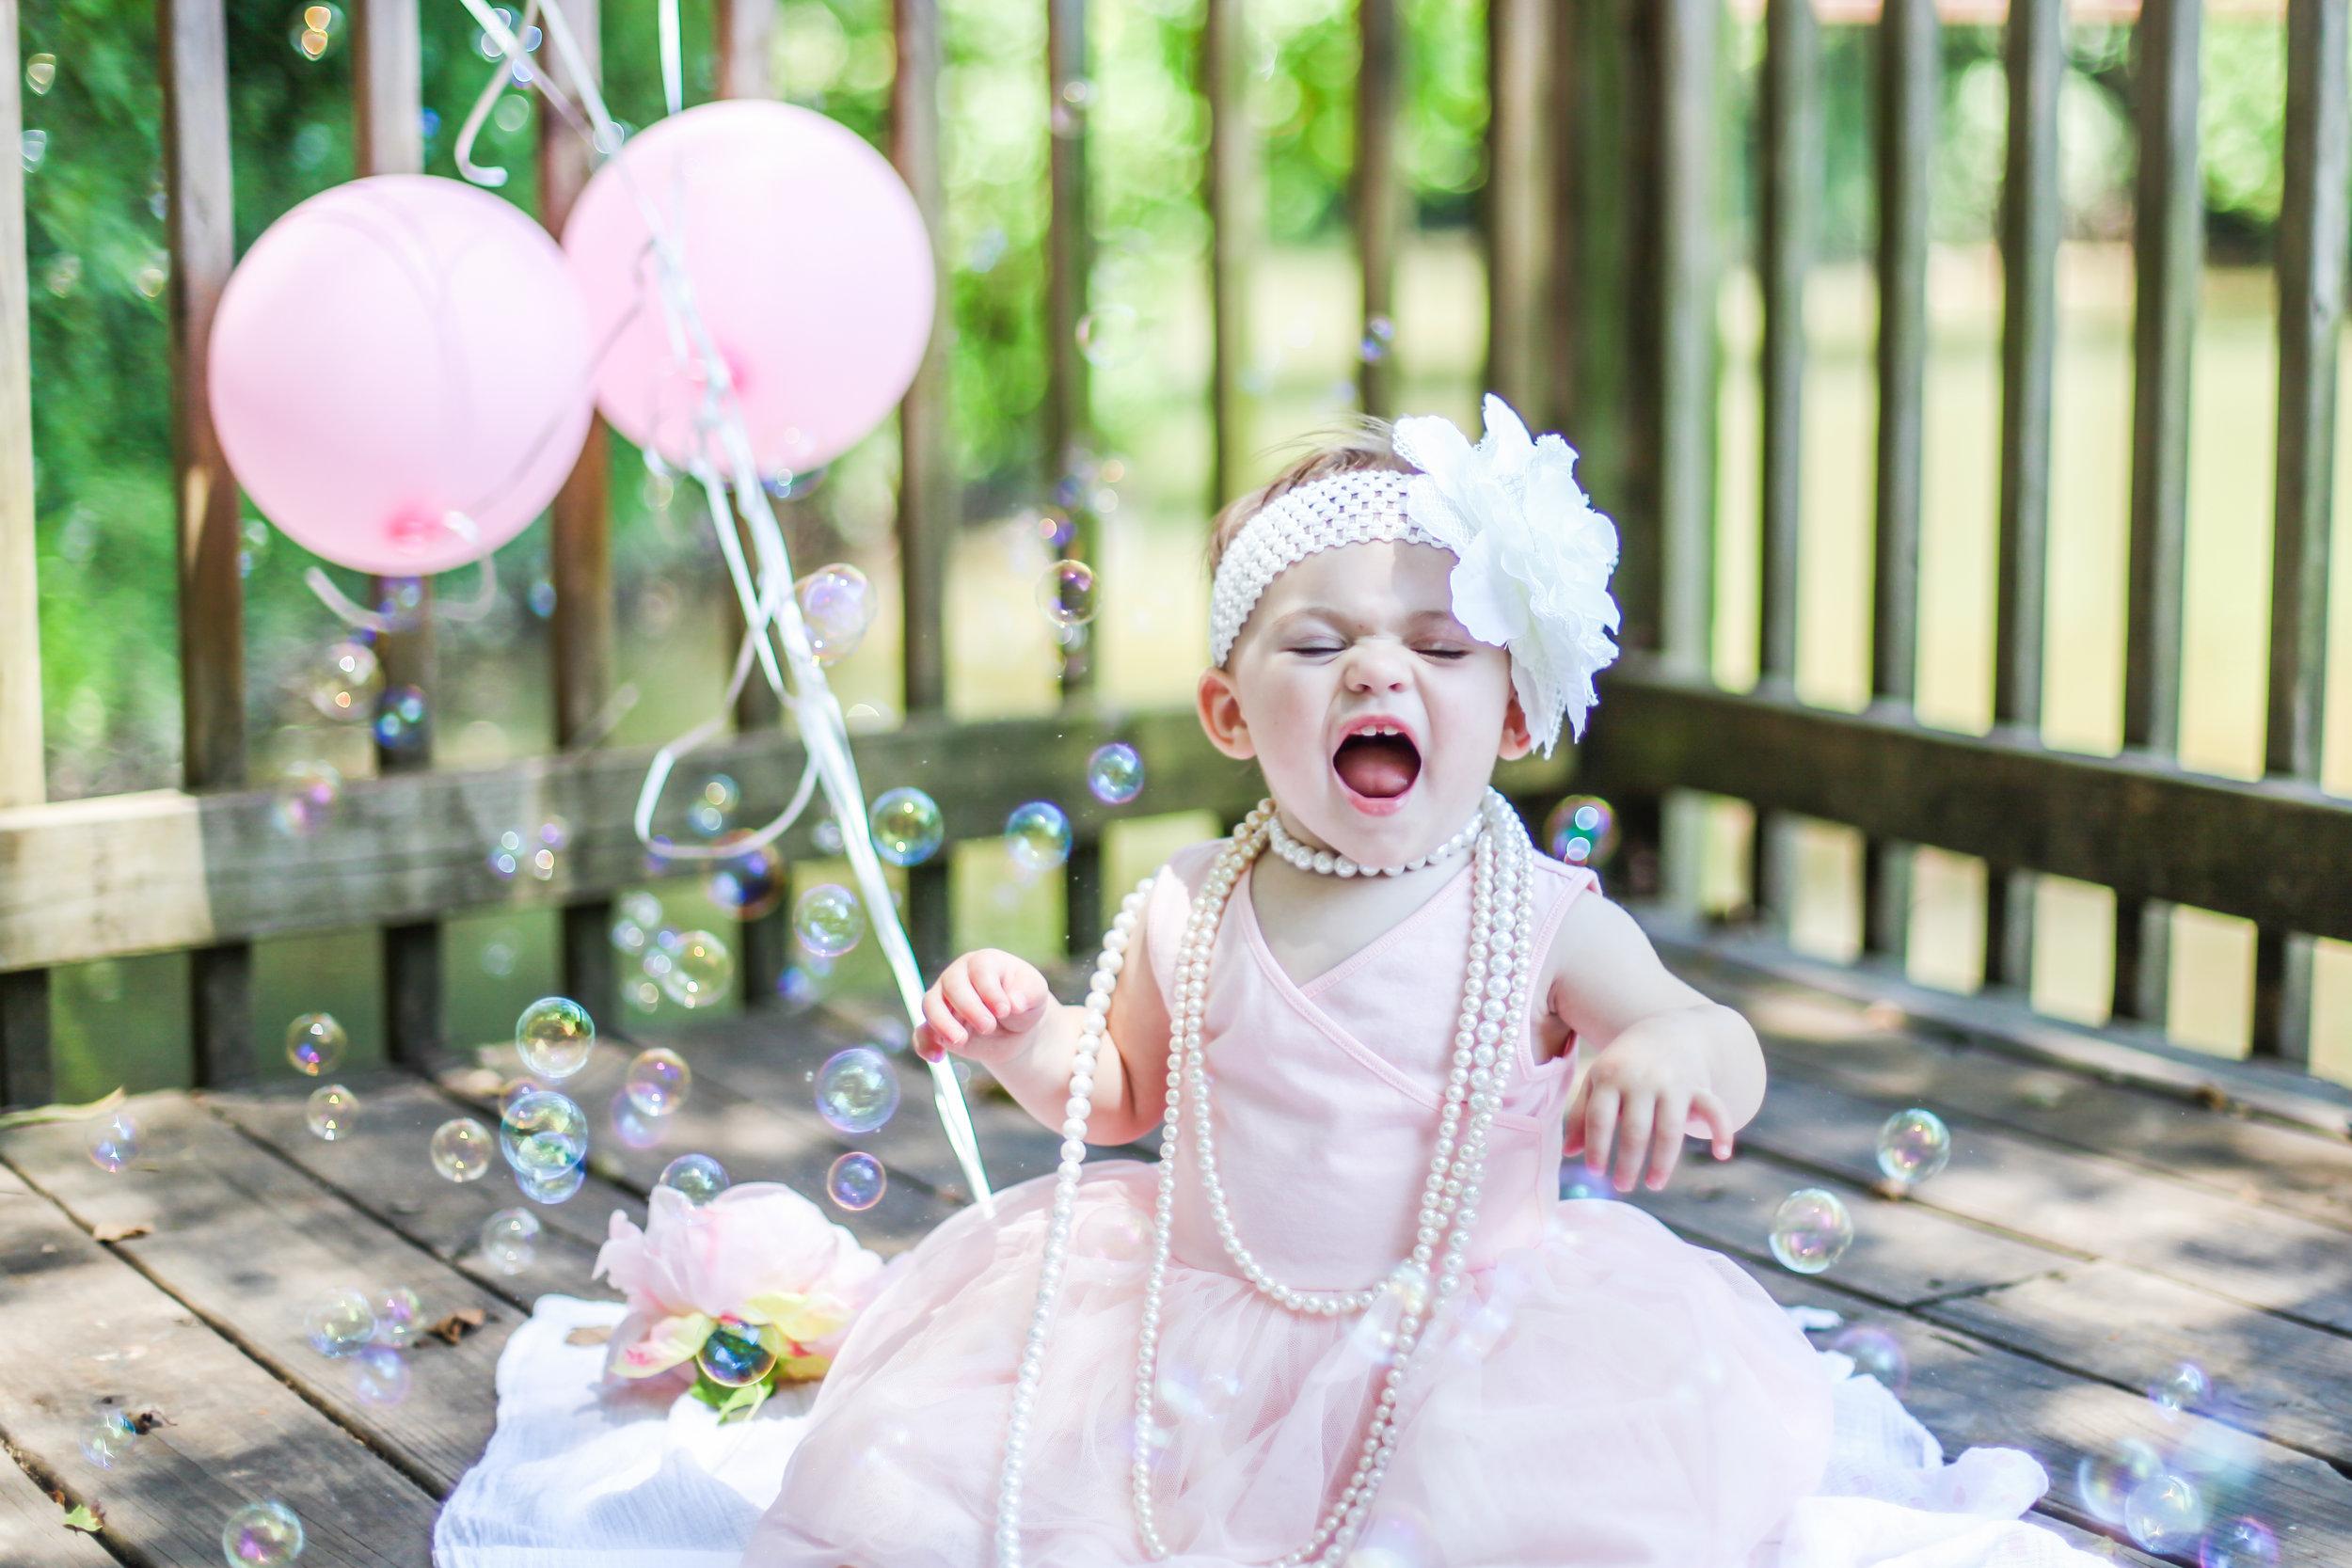 woodstock baby photography angela elliott-49.jpg